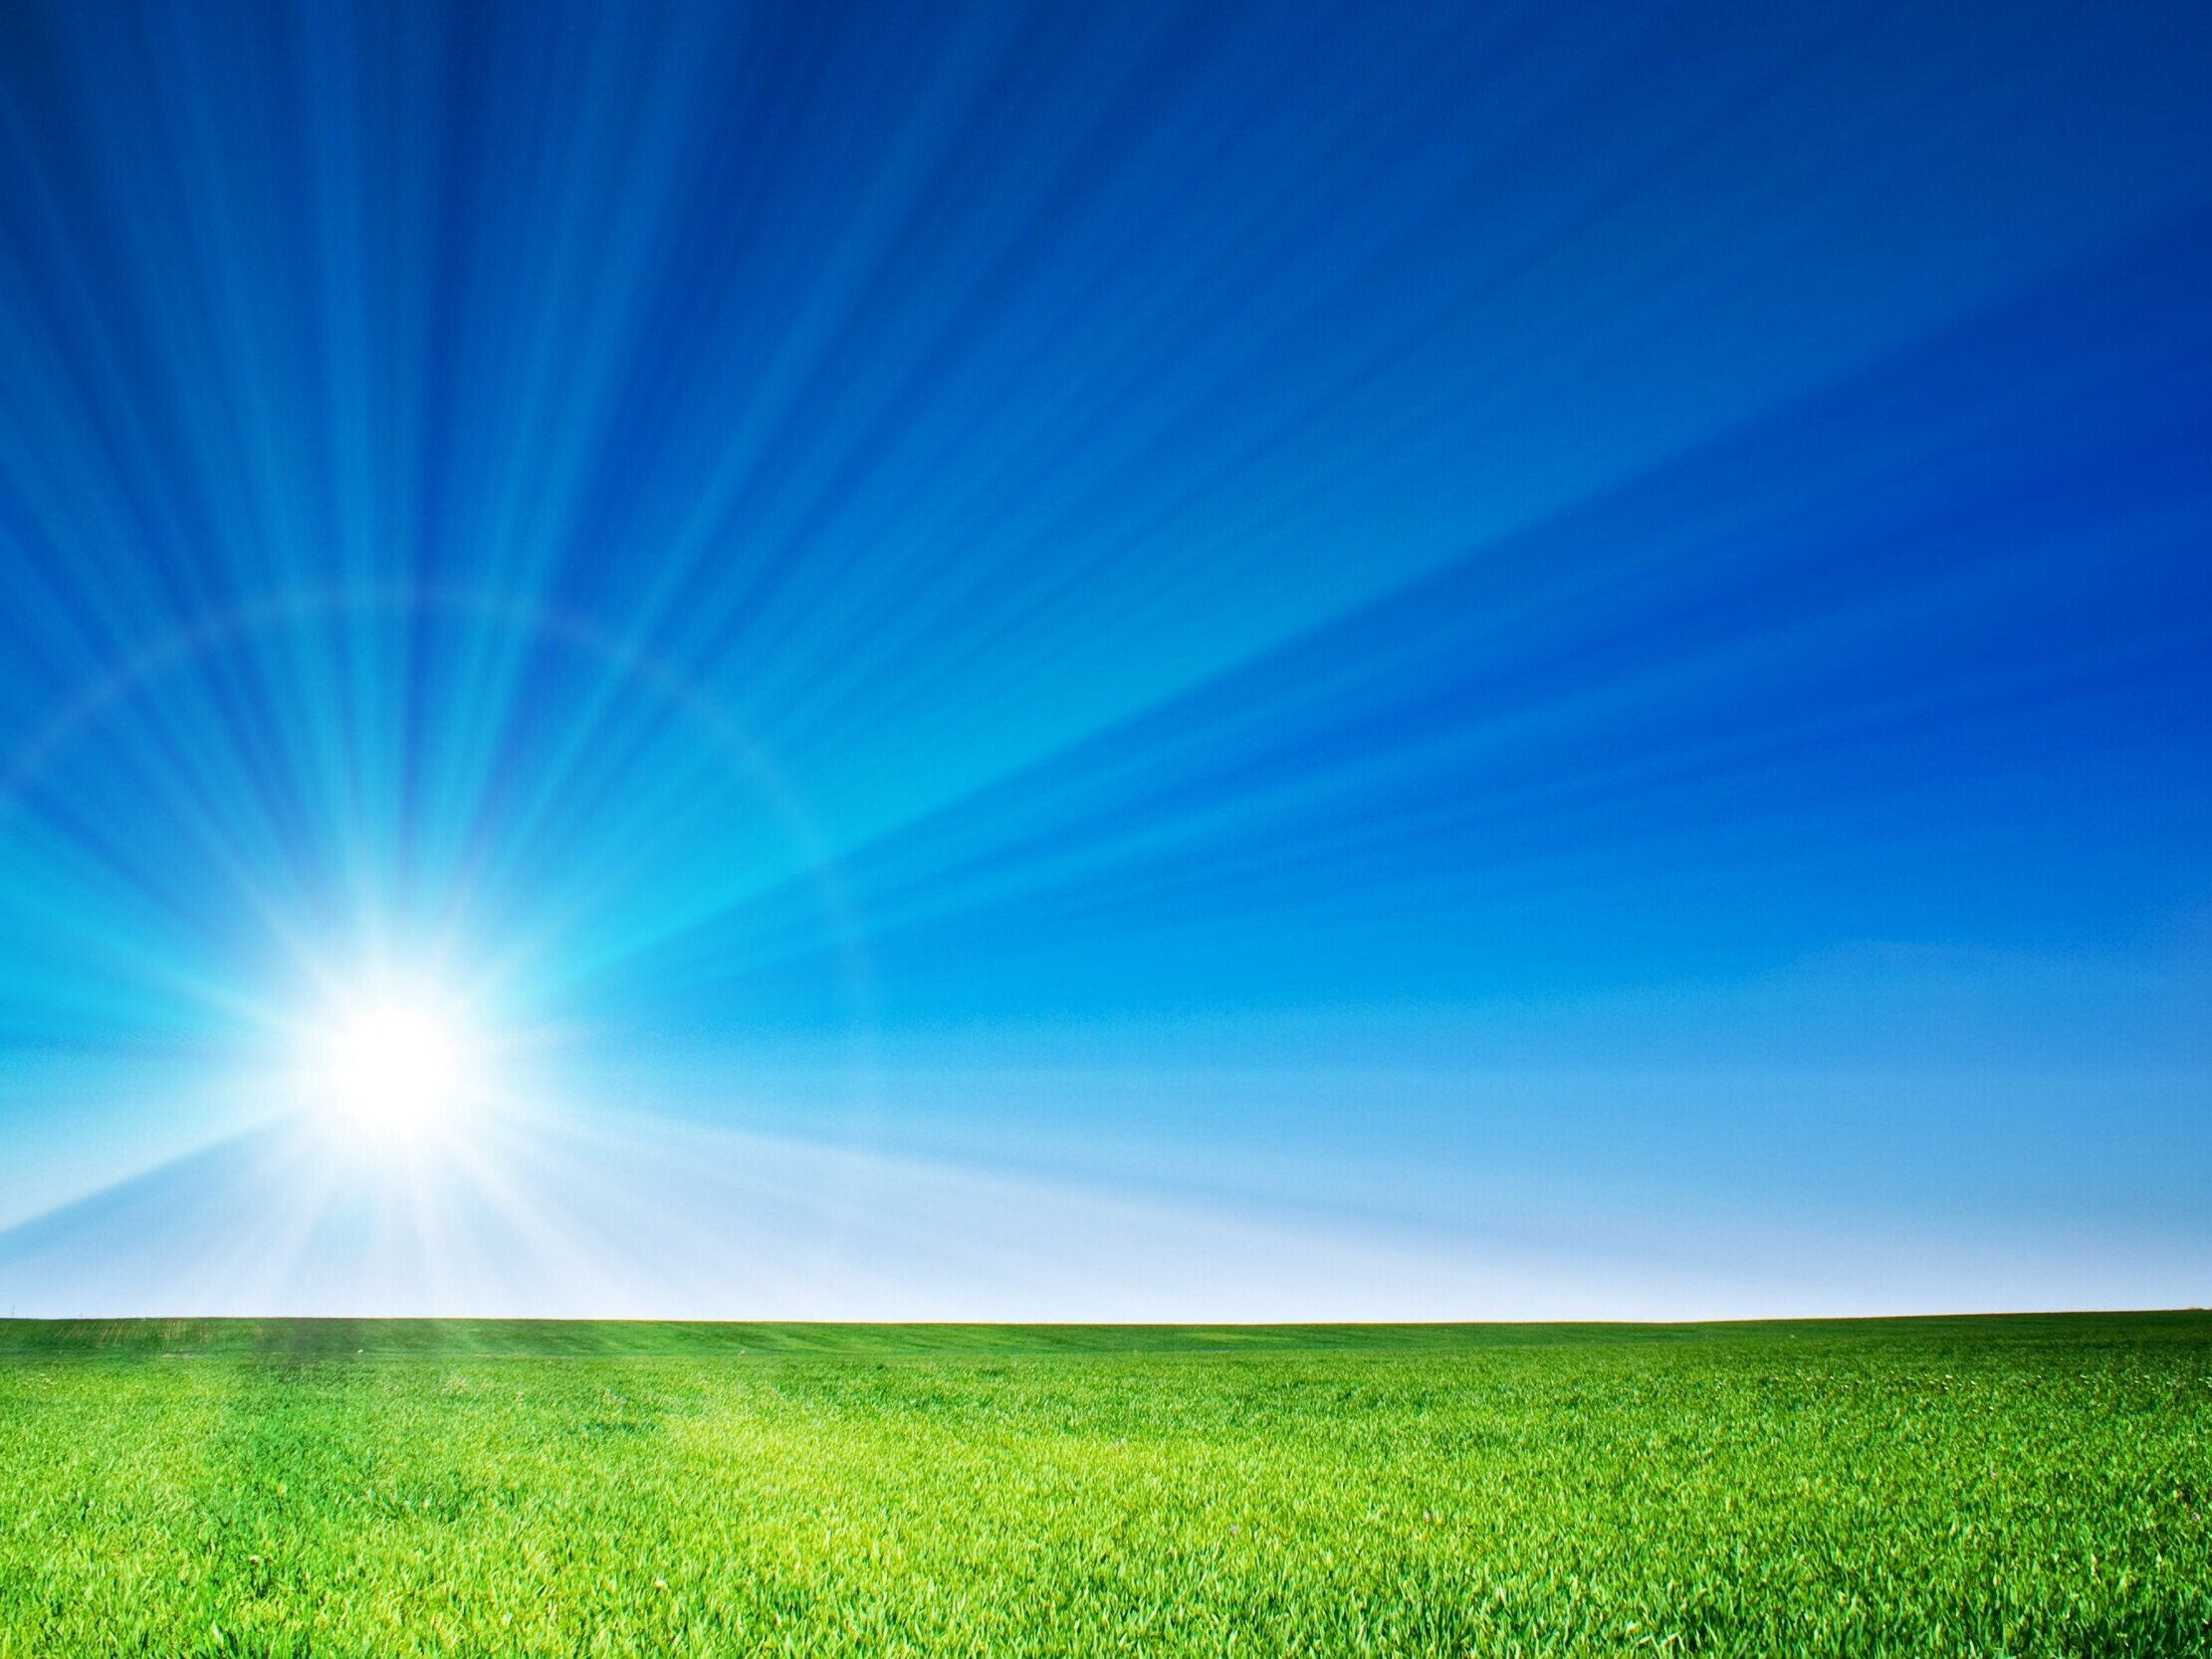 Sky%2C+grass%2C+sunlight.jpg